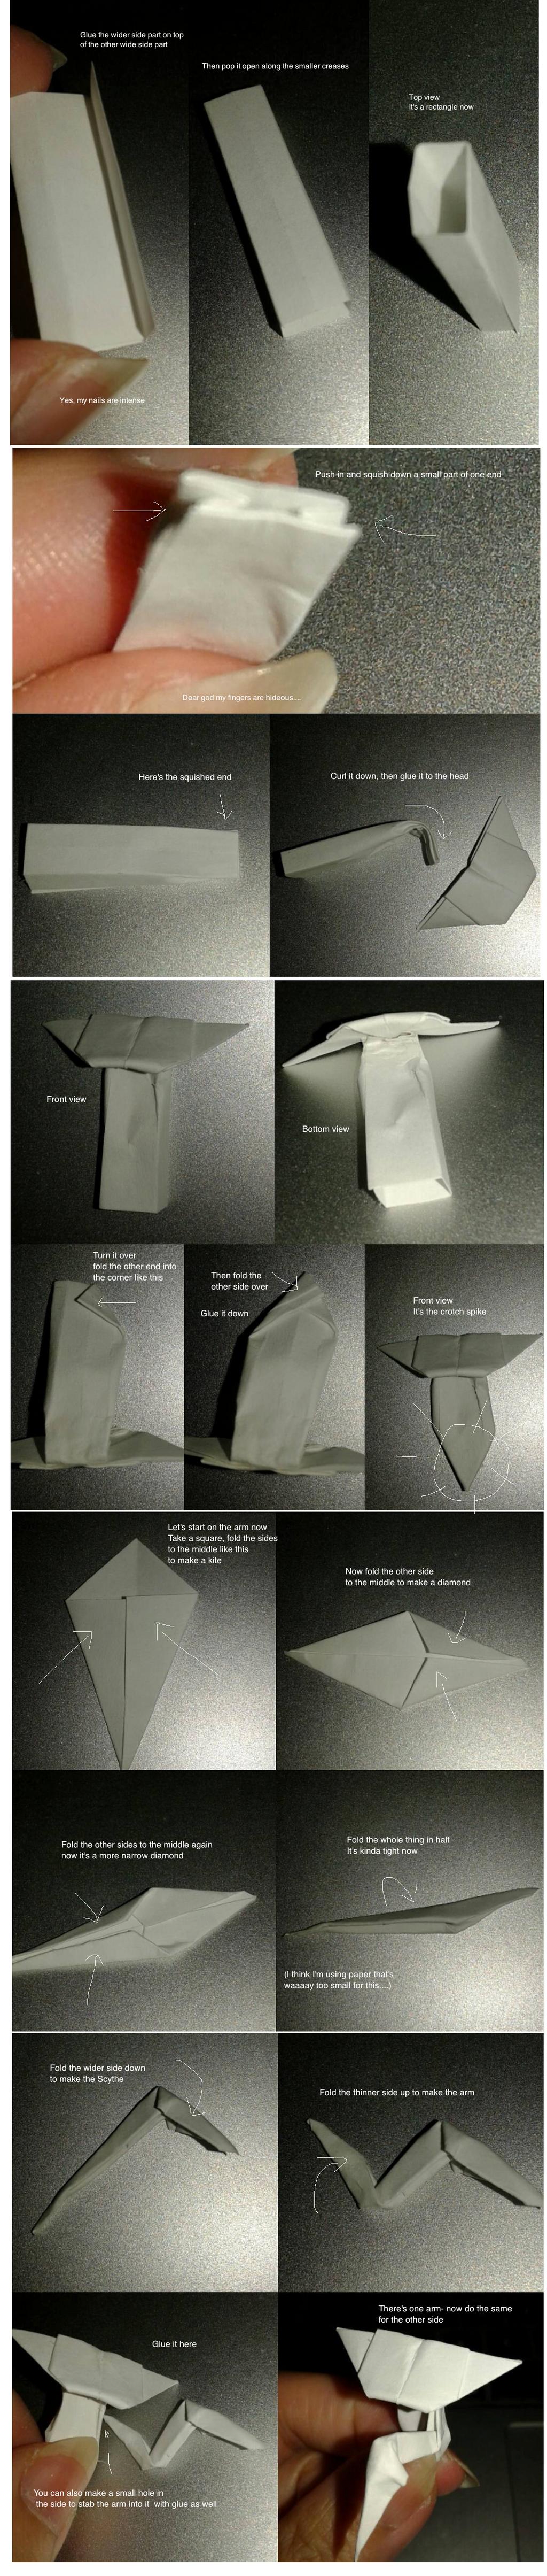 Papercraft Kabutops tutorial 2 by okamitsuki